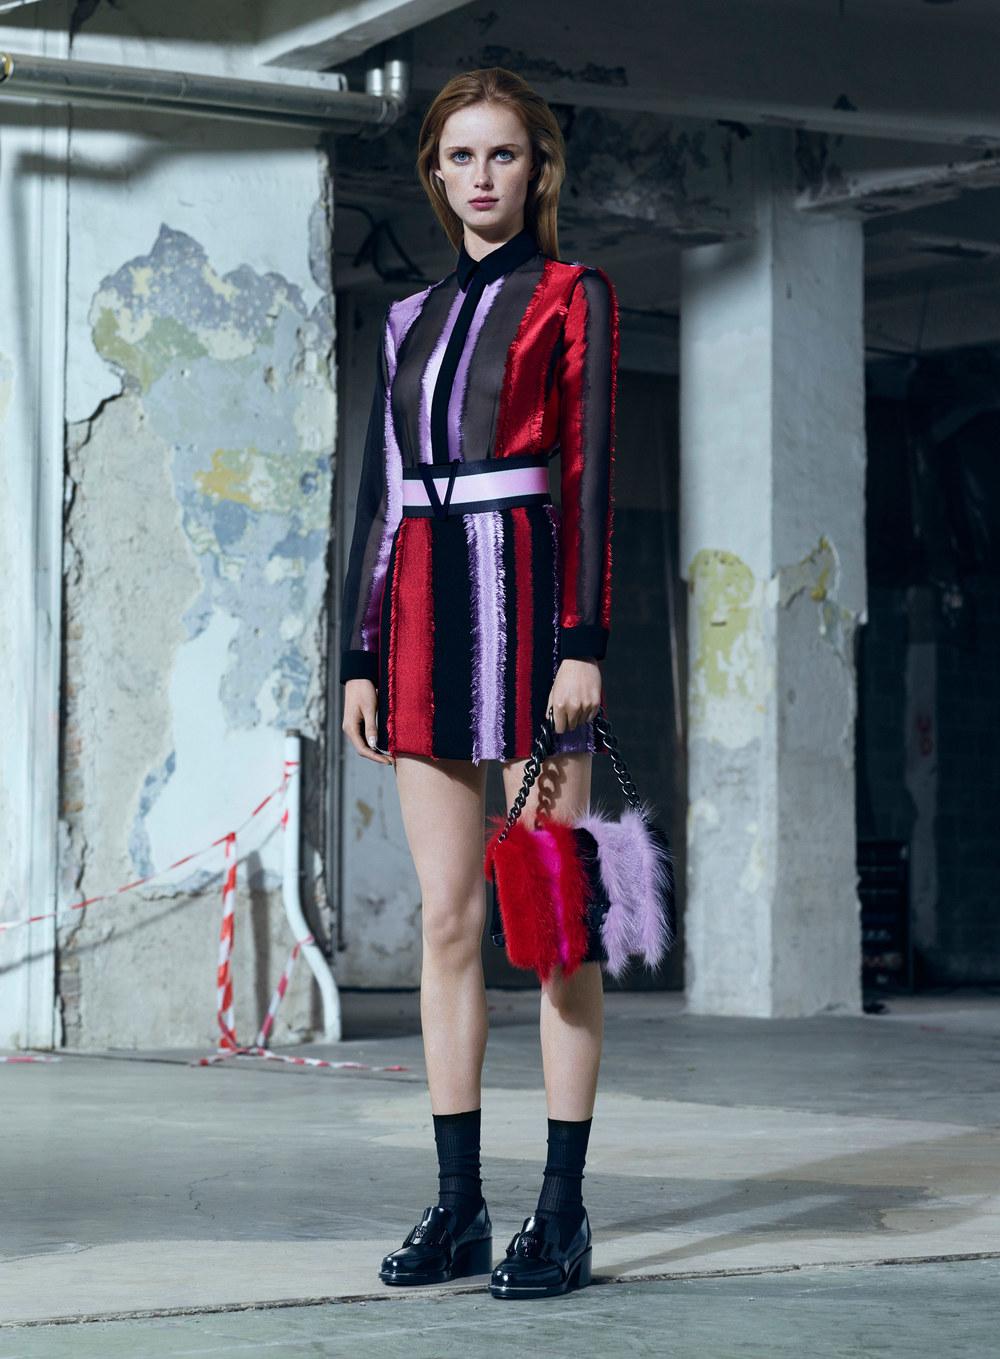 versace-pre-fall-2016-lookbook-22.jpg